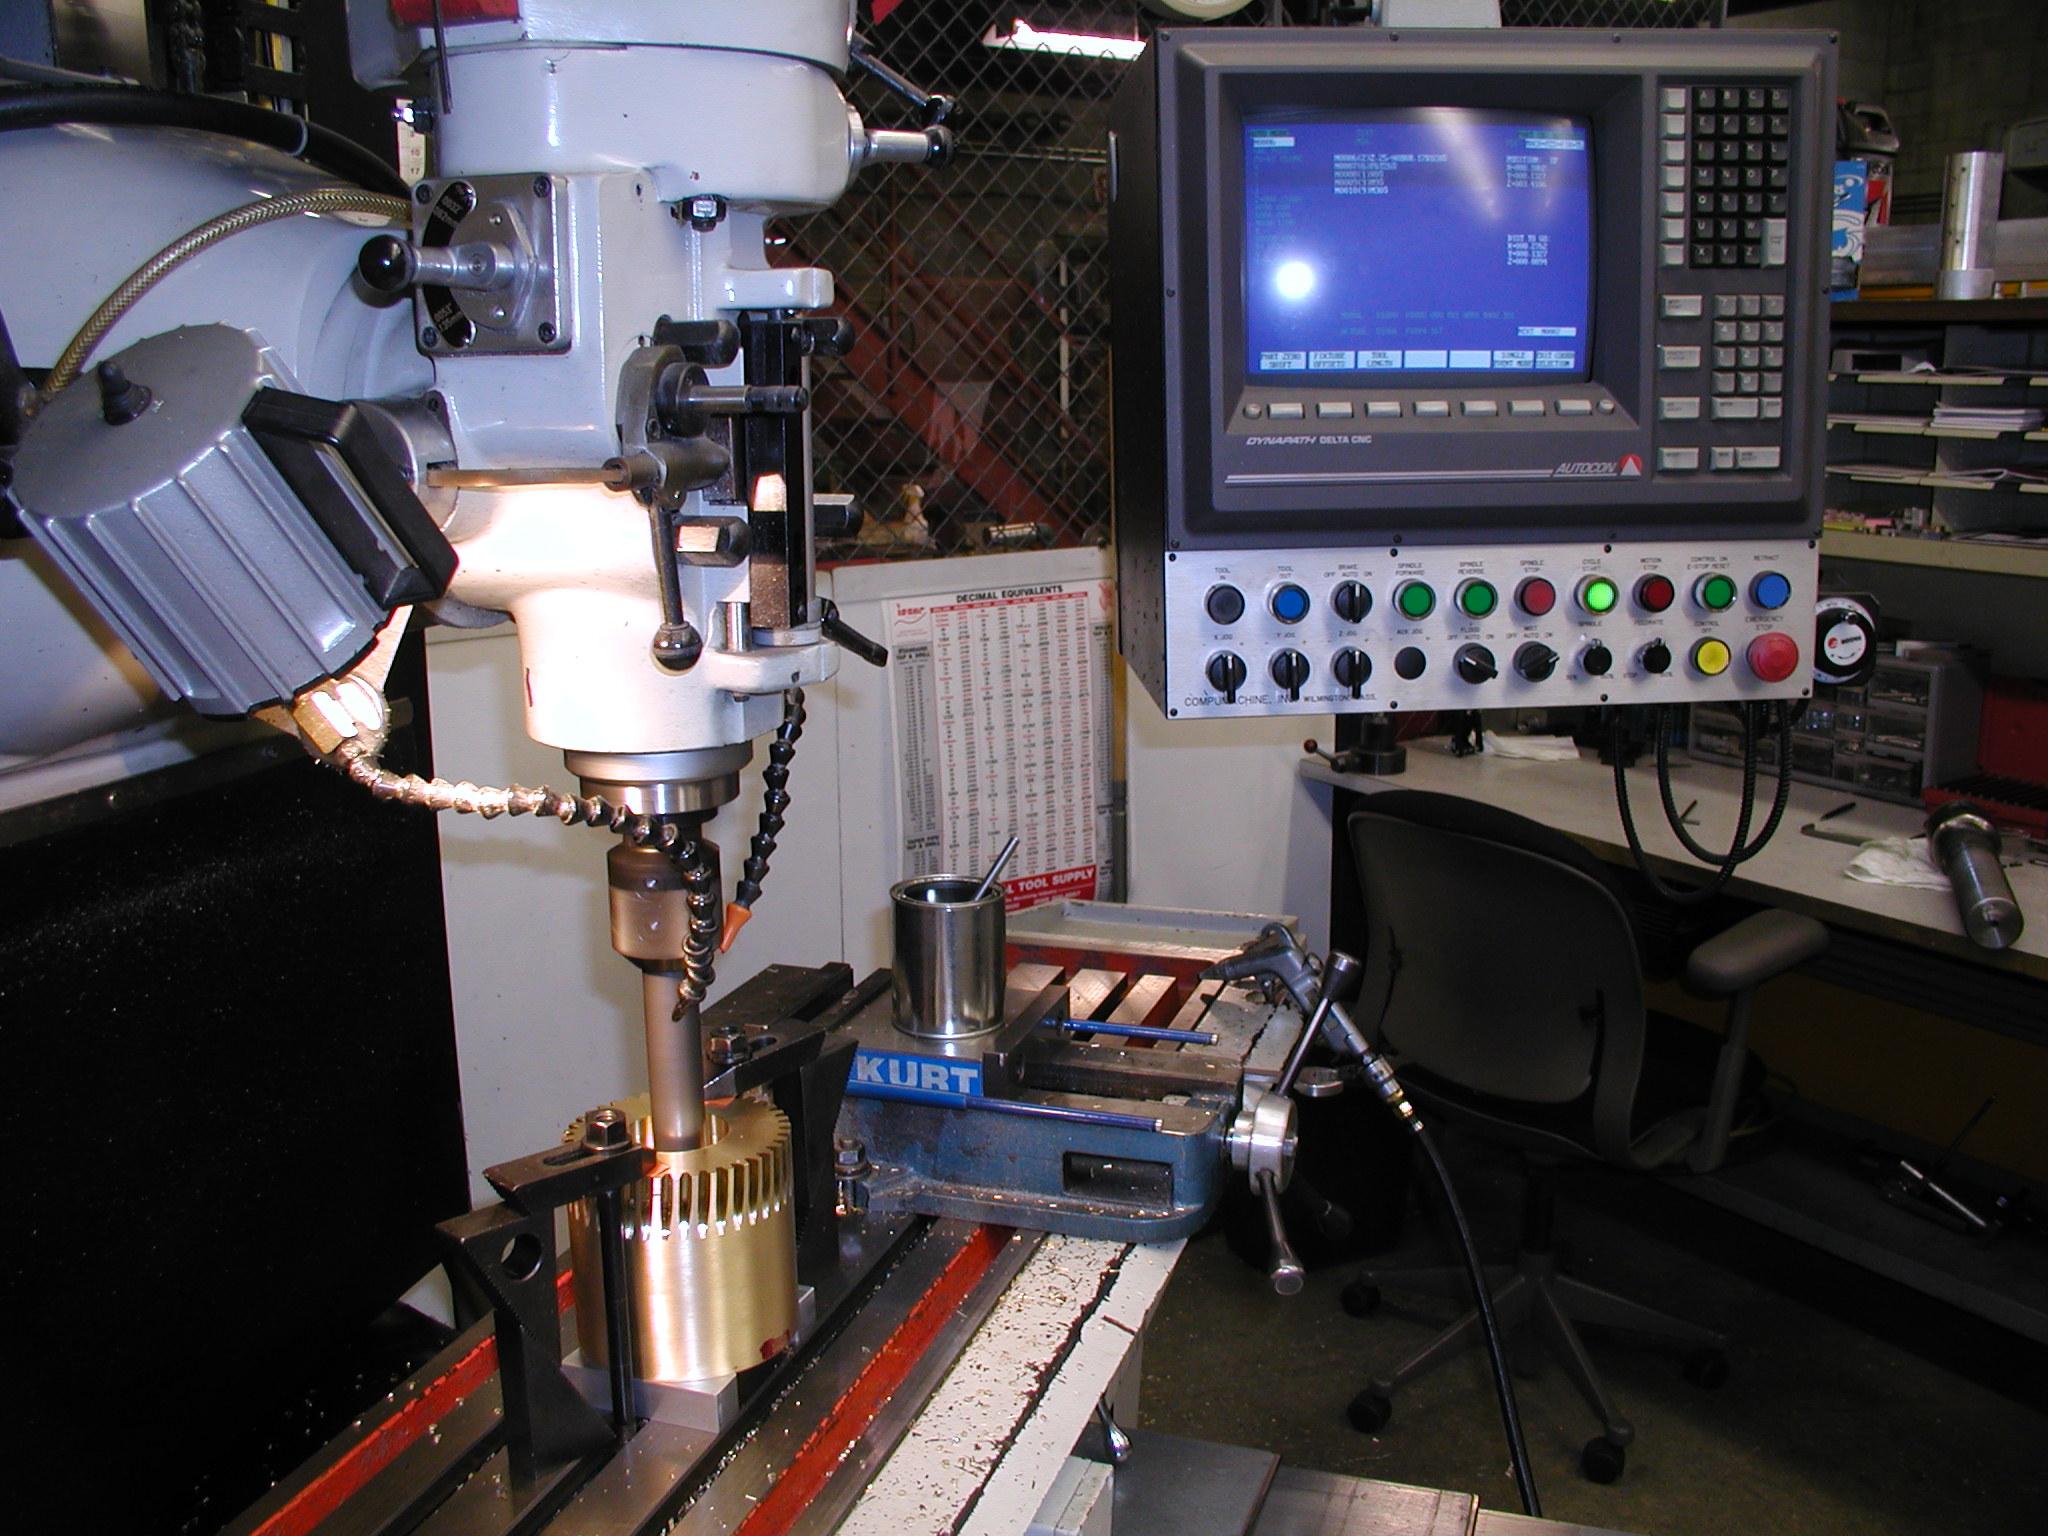 4stanley_engineering_pictures_044.jpg